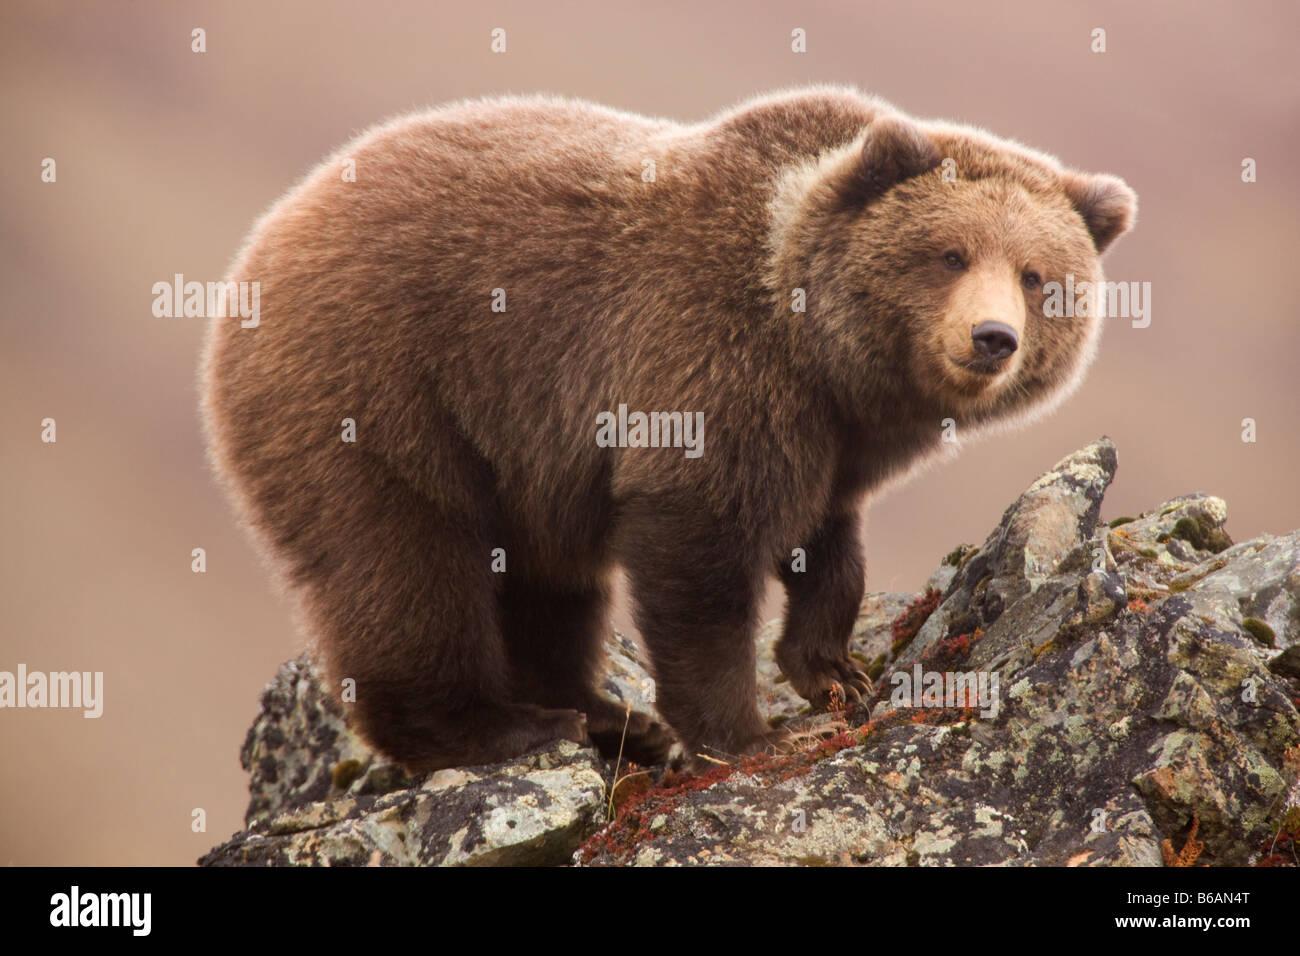 Grizzly Bear, también llamado oso pardo Denali National Park Alaska Imagen De Stock